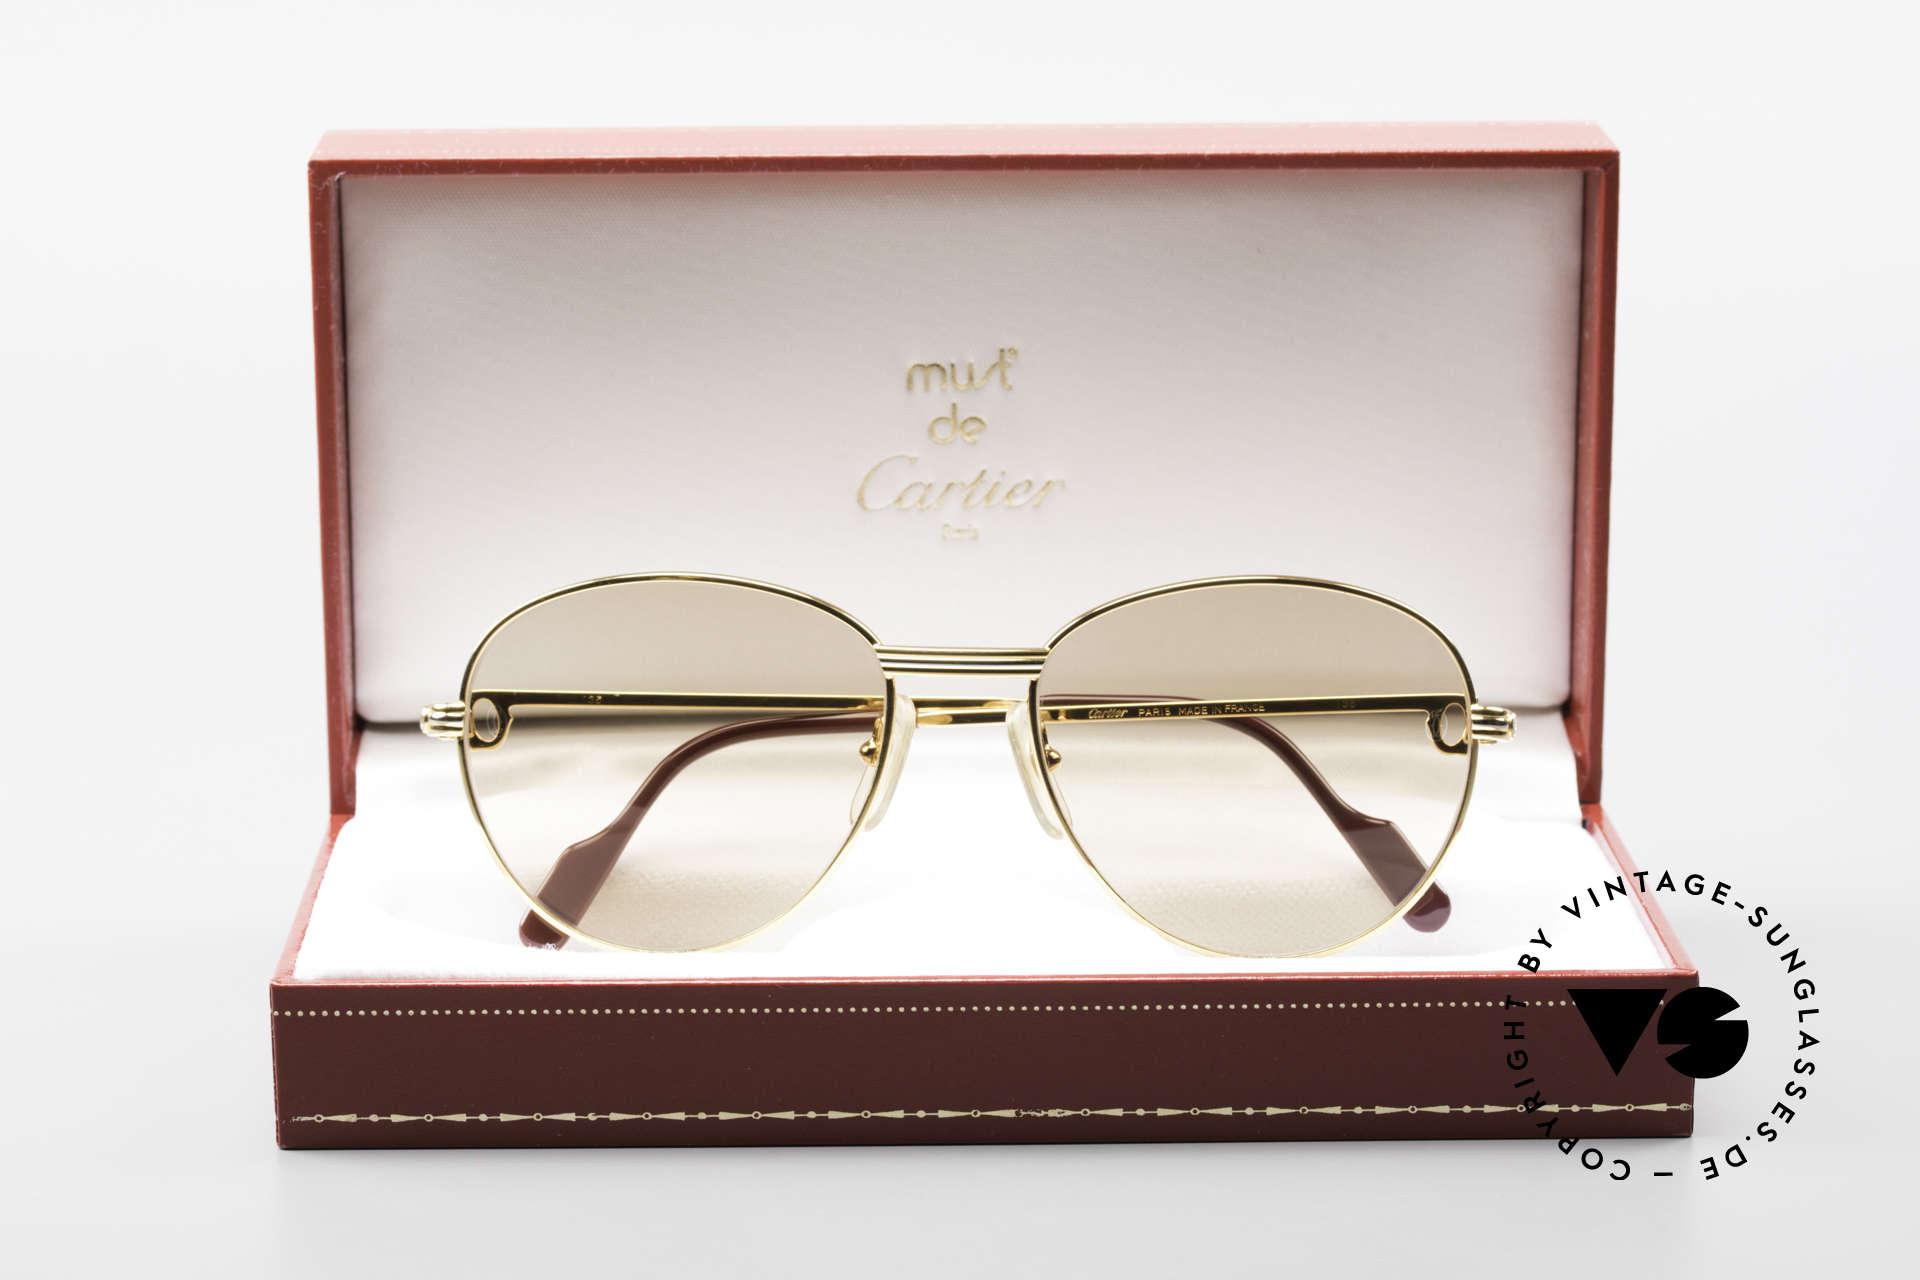 Cartier S Brillants 0,20 ct 1980's Diamond Sunglasses, Size: medium, Made for Women